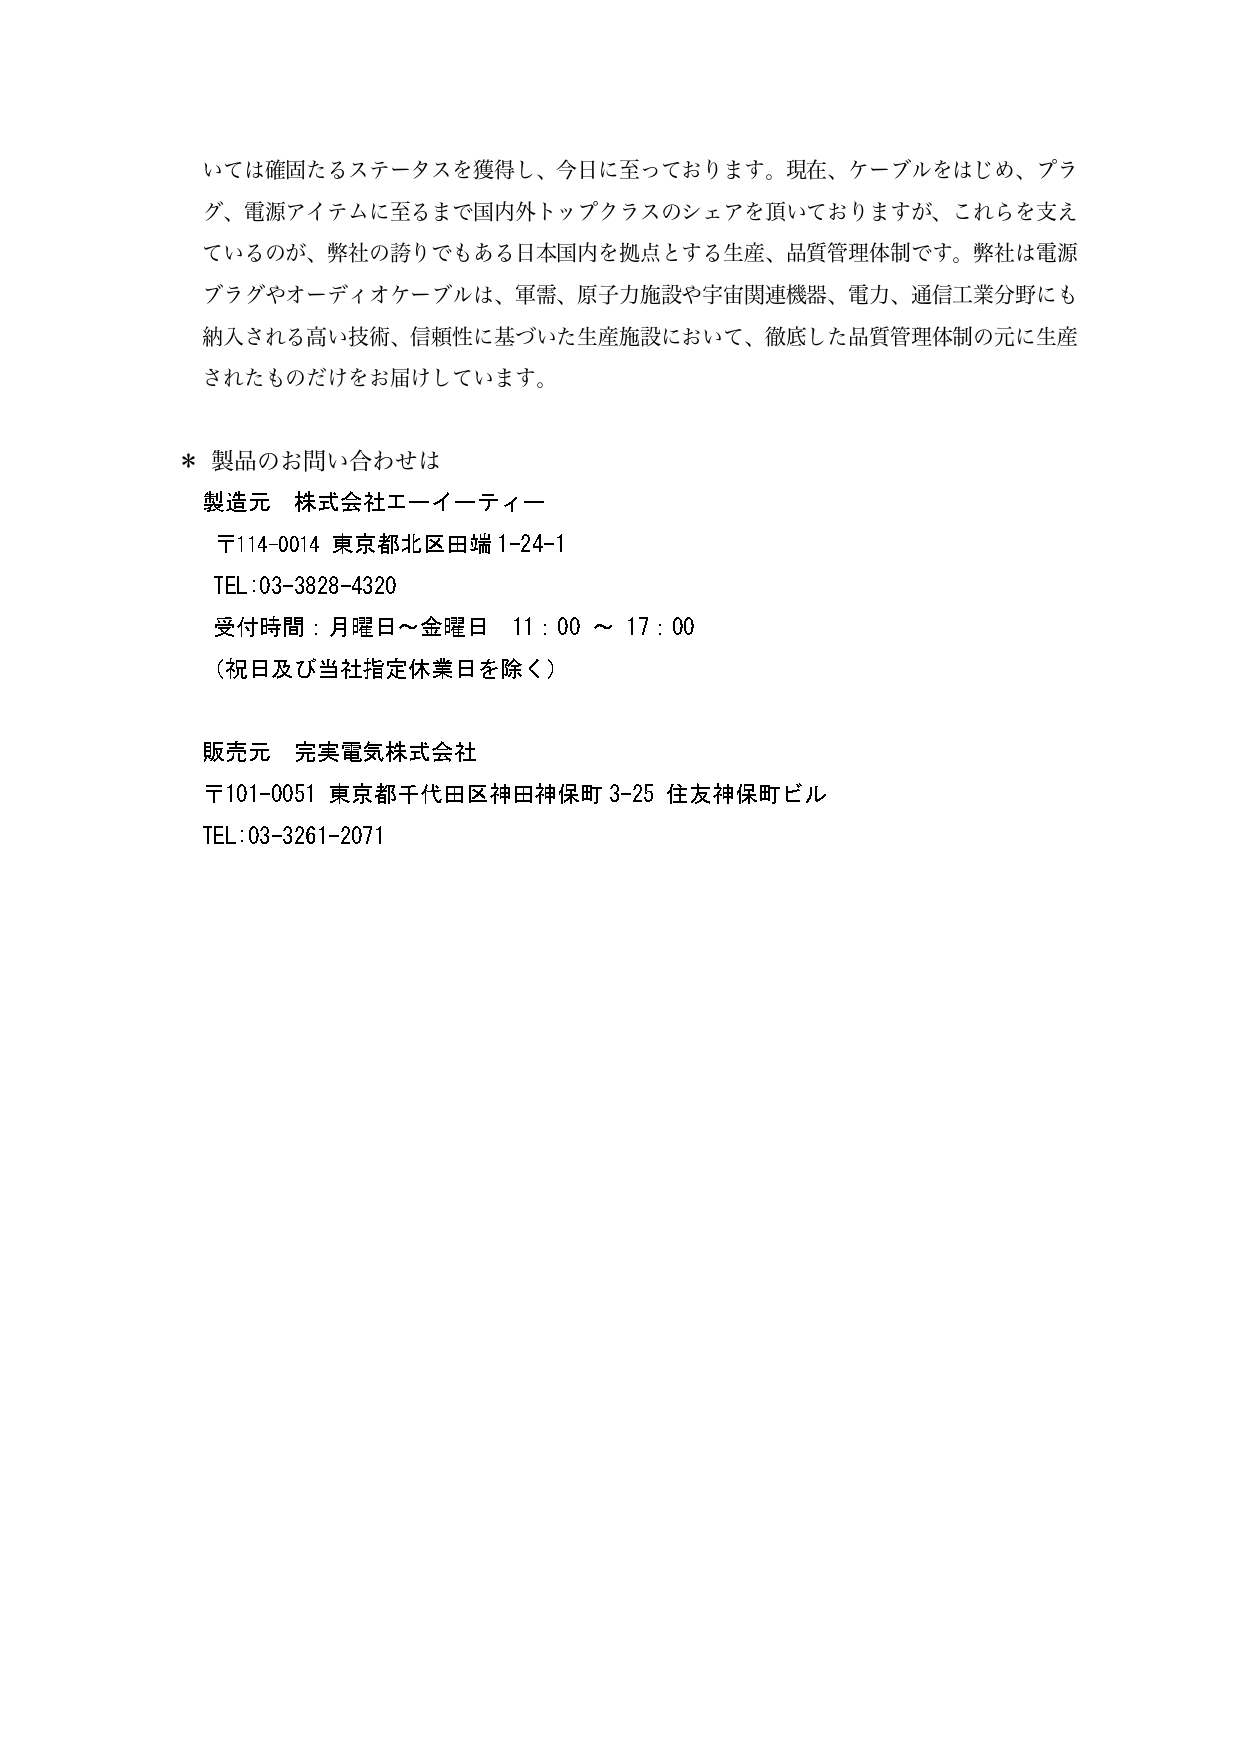 EVO-BLHGリリース_page-0004